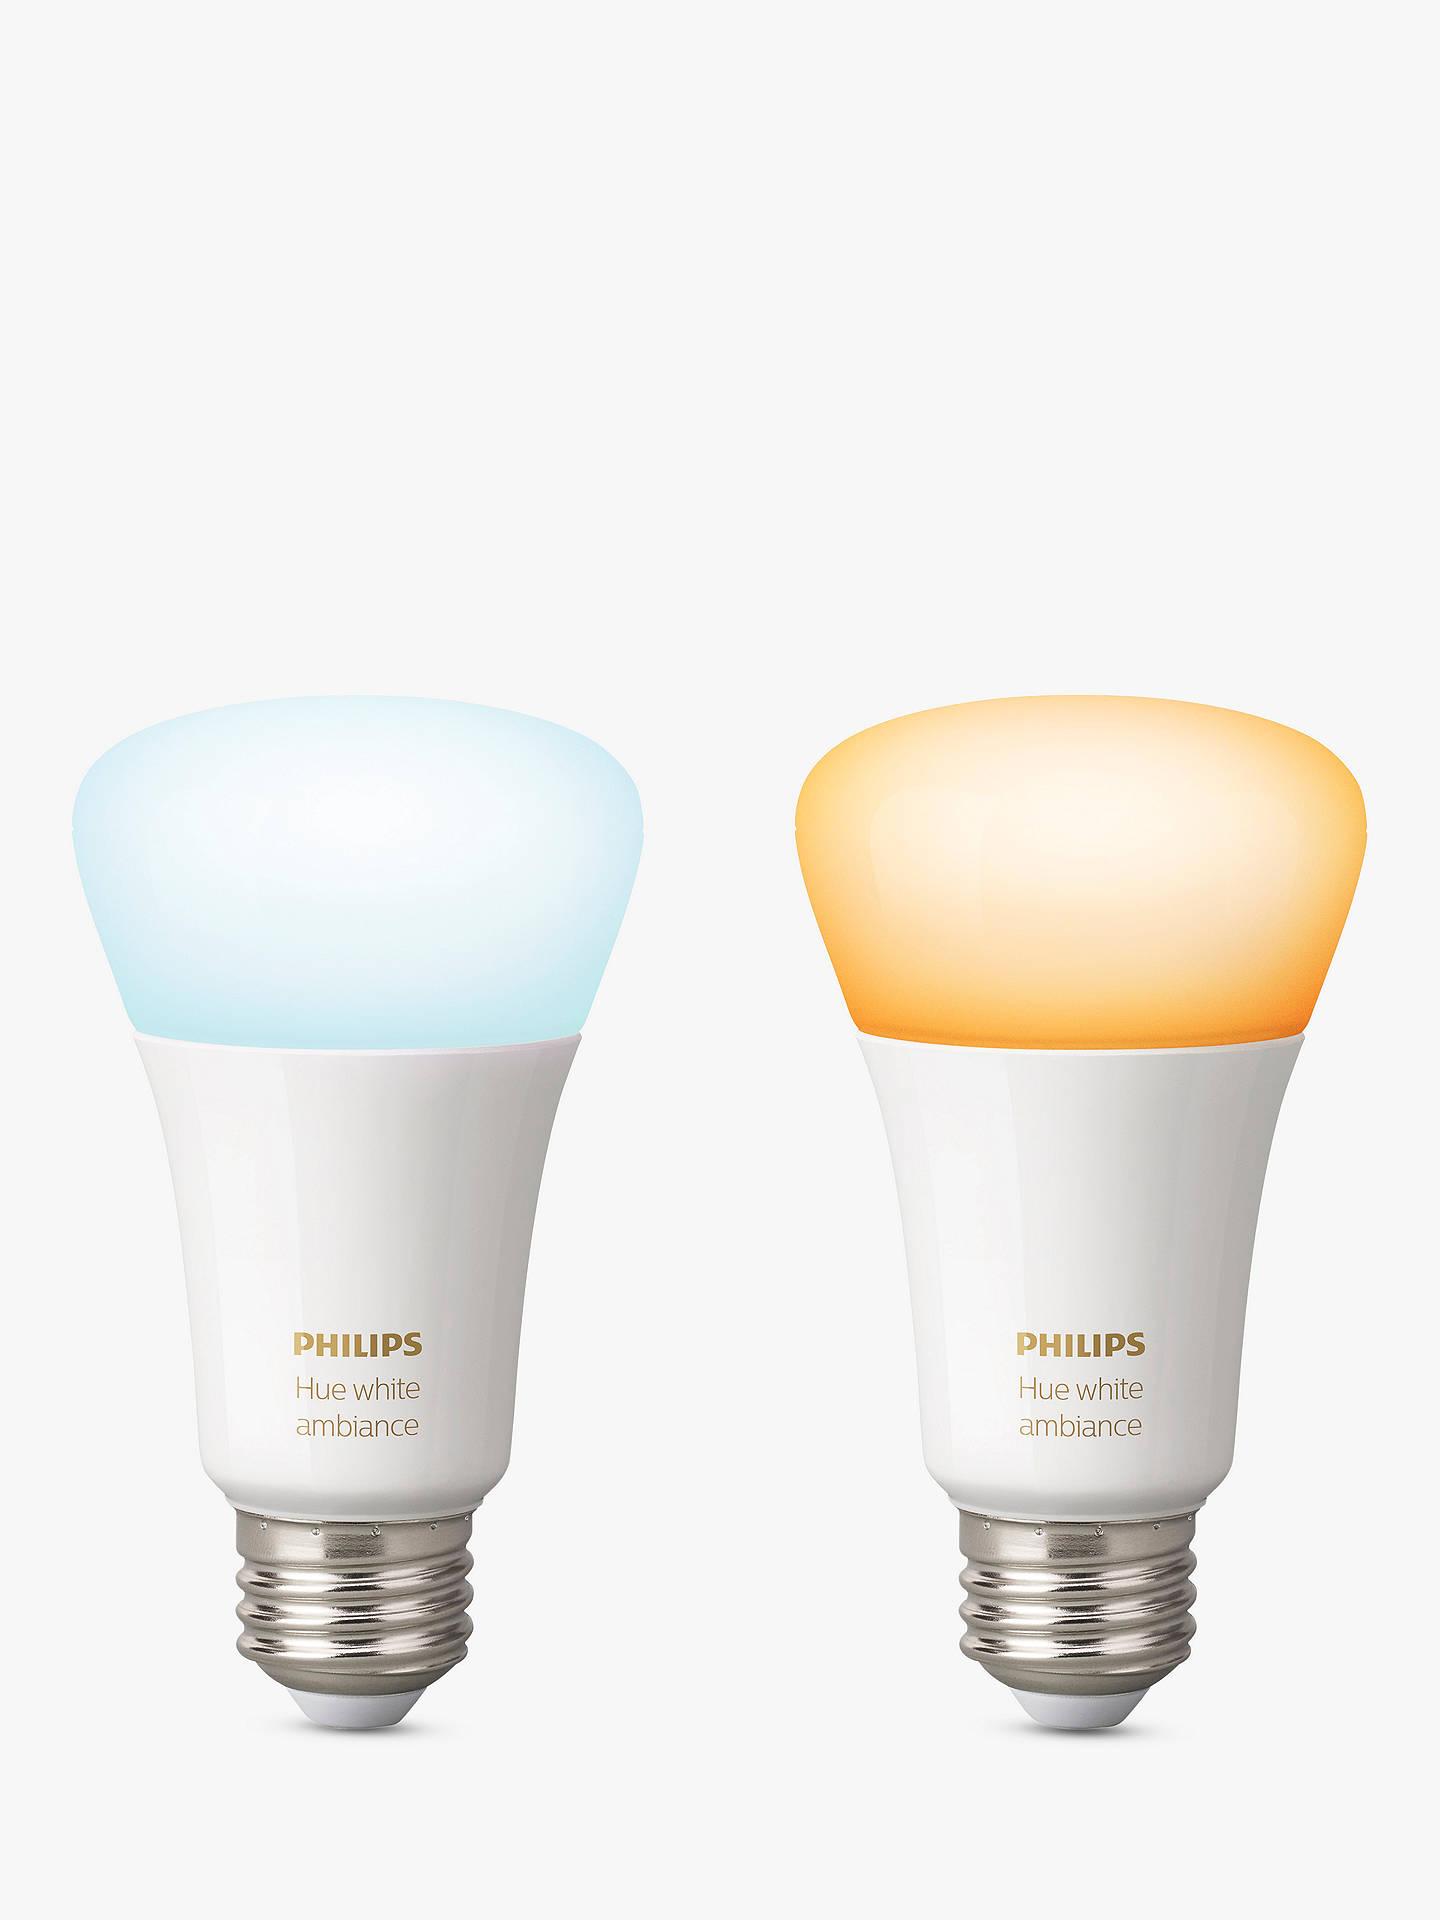 philips hue white ambiance wireless lighting led light. Black Bedroom Furniture Sets. Home Design Ideas